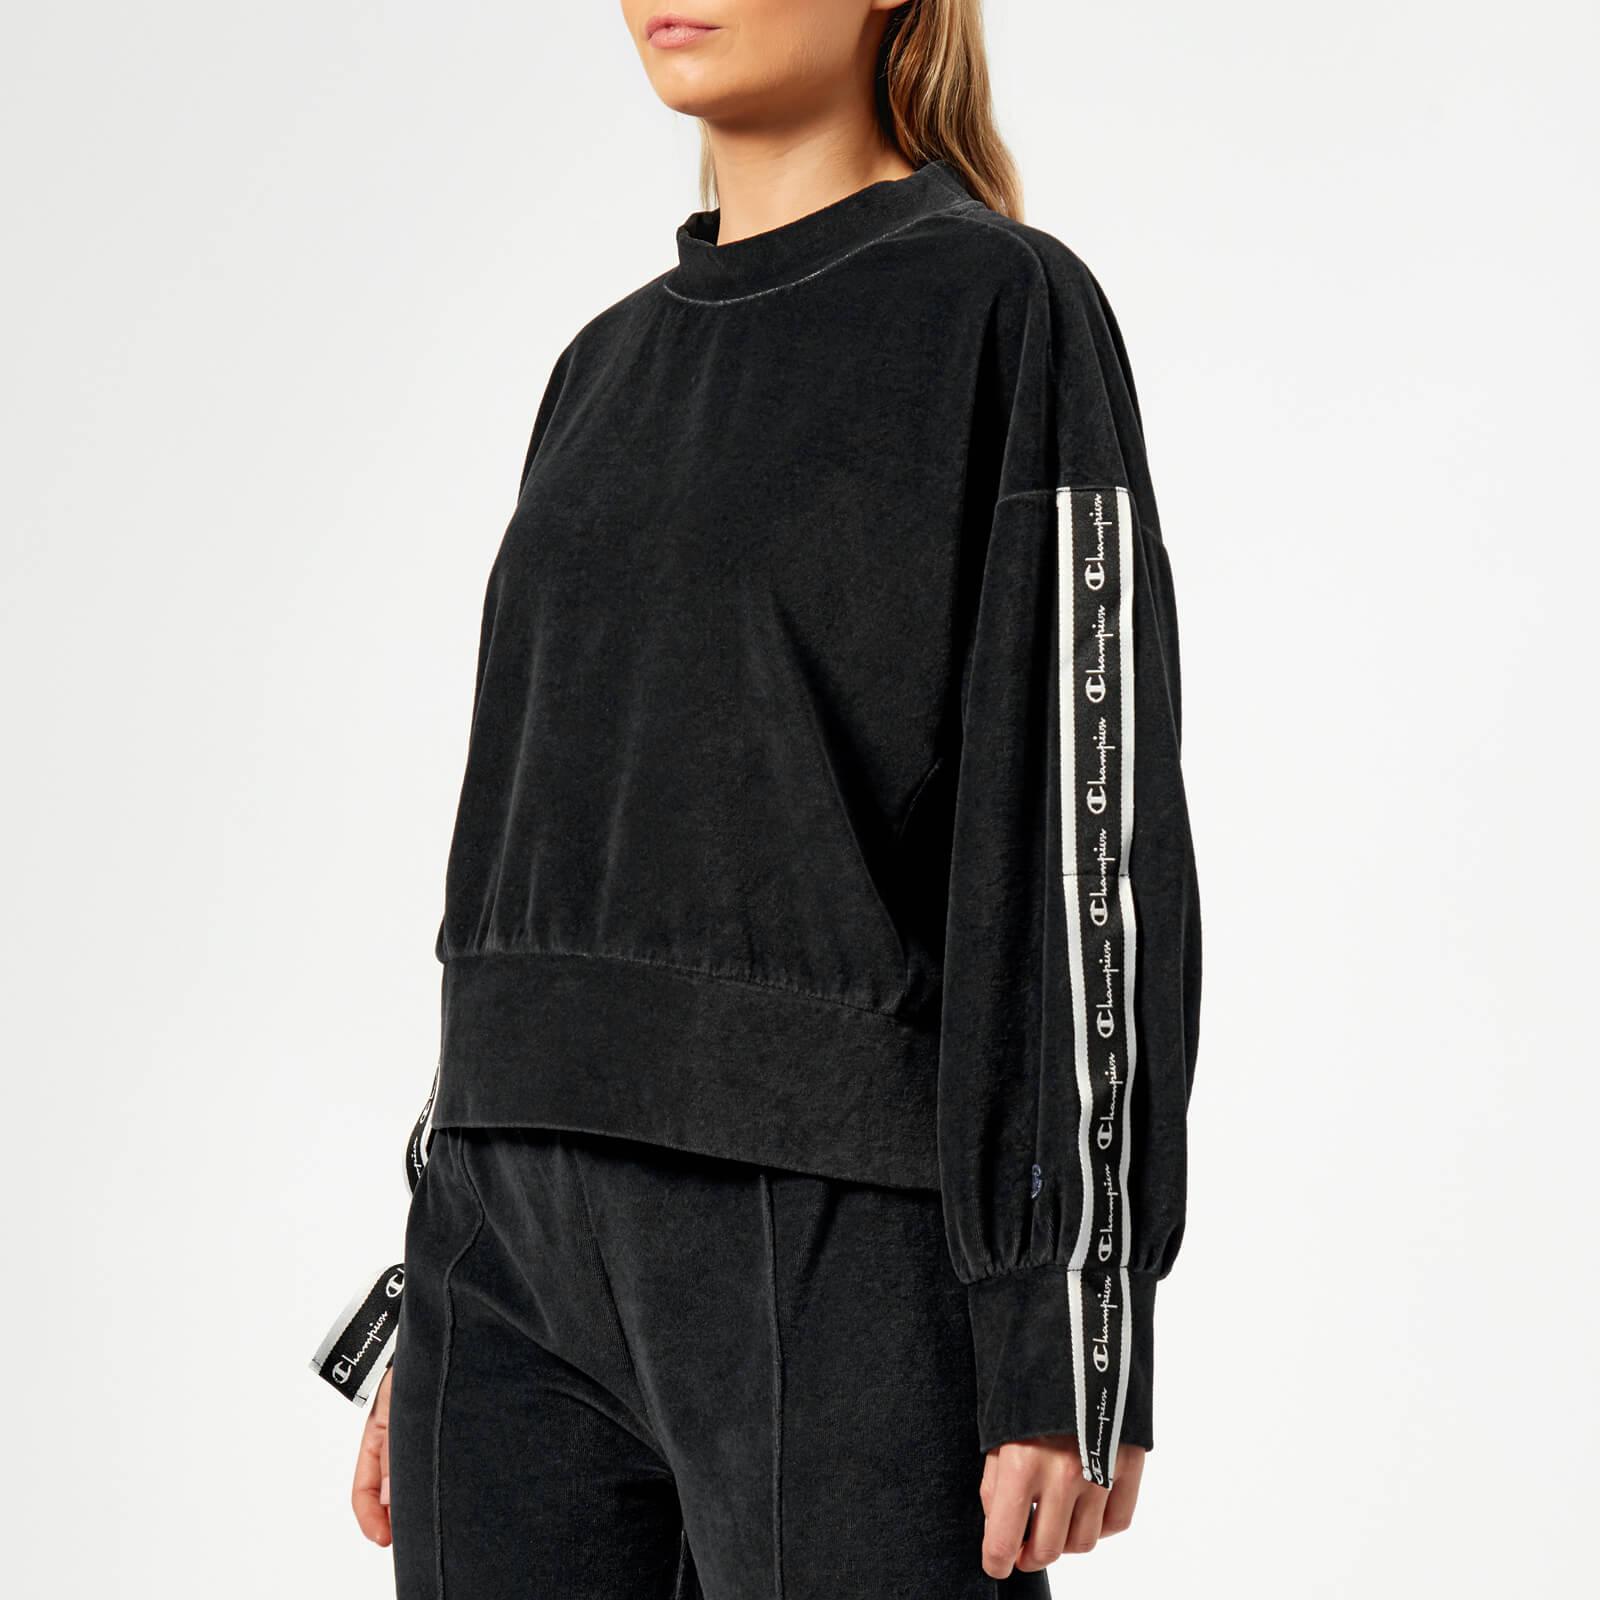 521b572e9 Champion Women's Crew Neck Velour Sweatshirt - Black